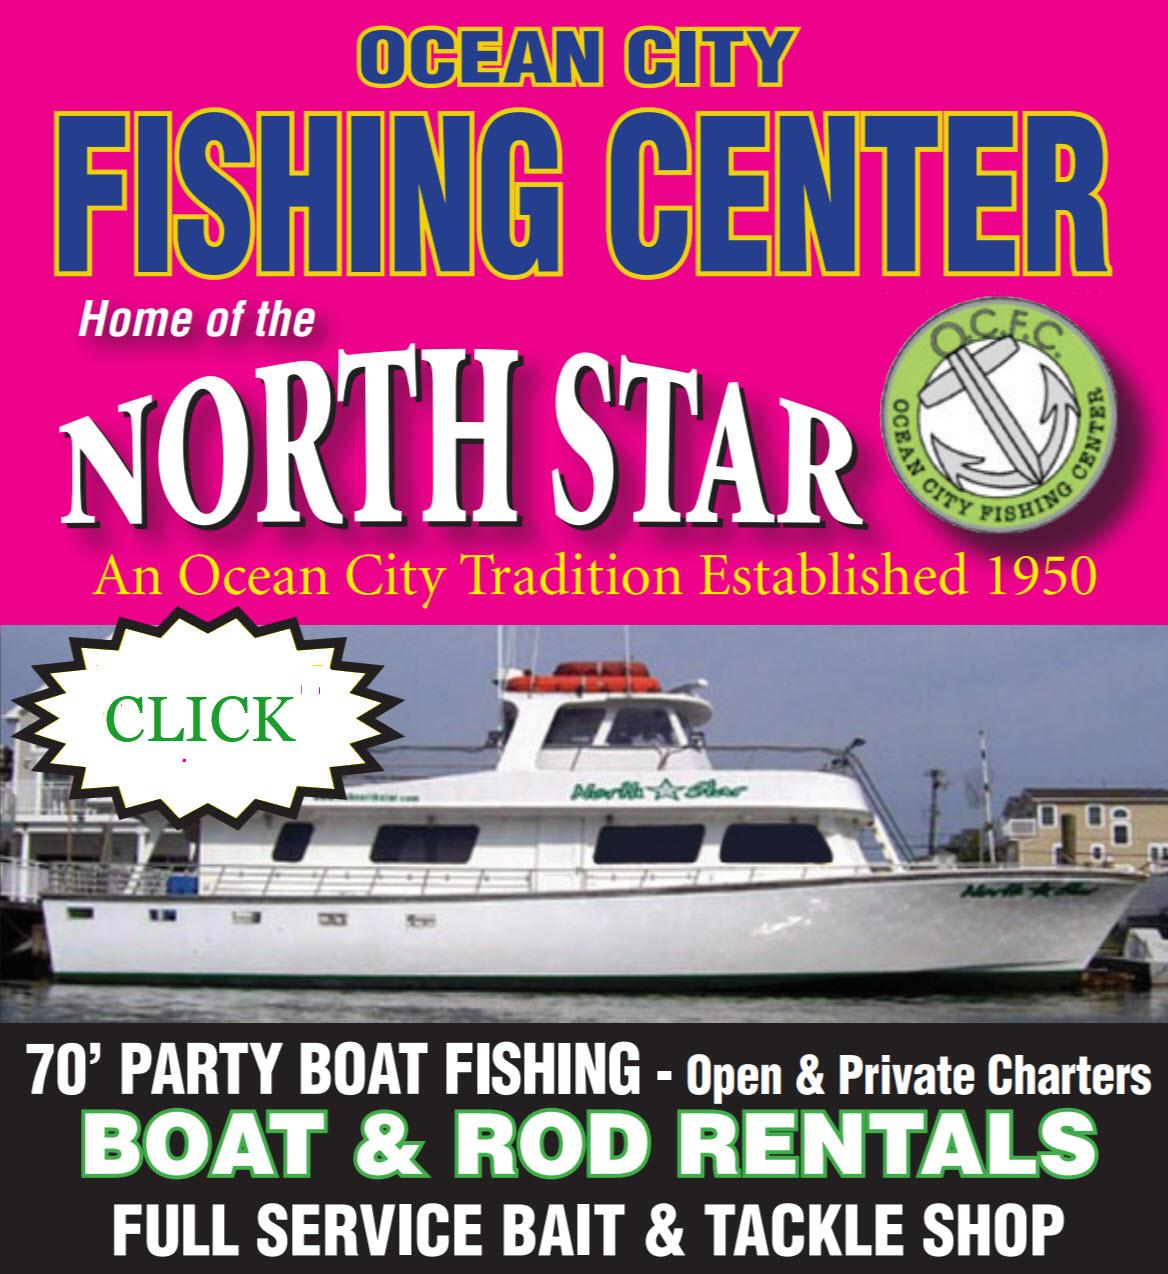 Atlantic City Ocean City Fishing Party Boat